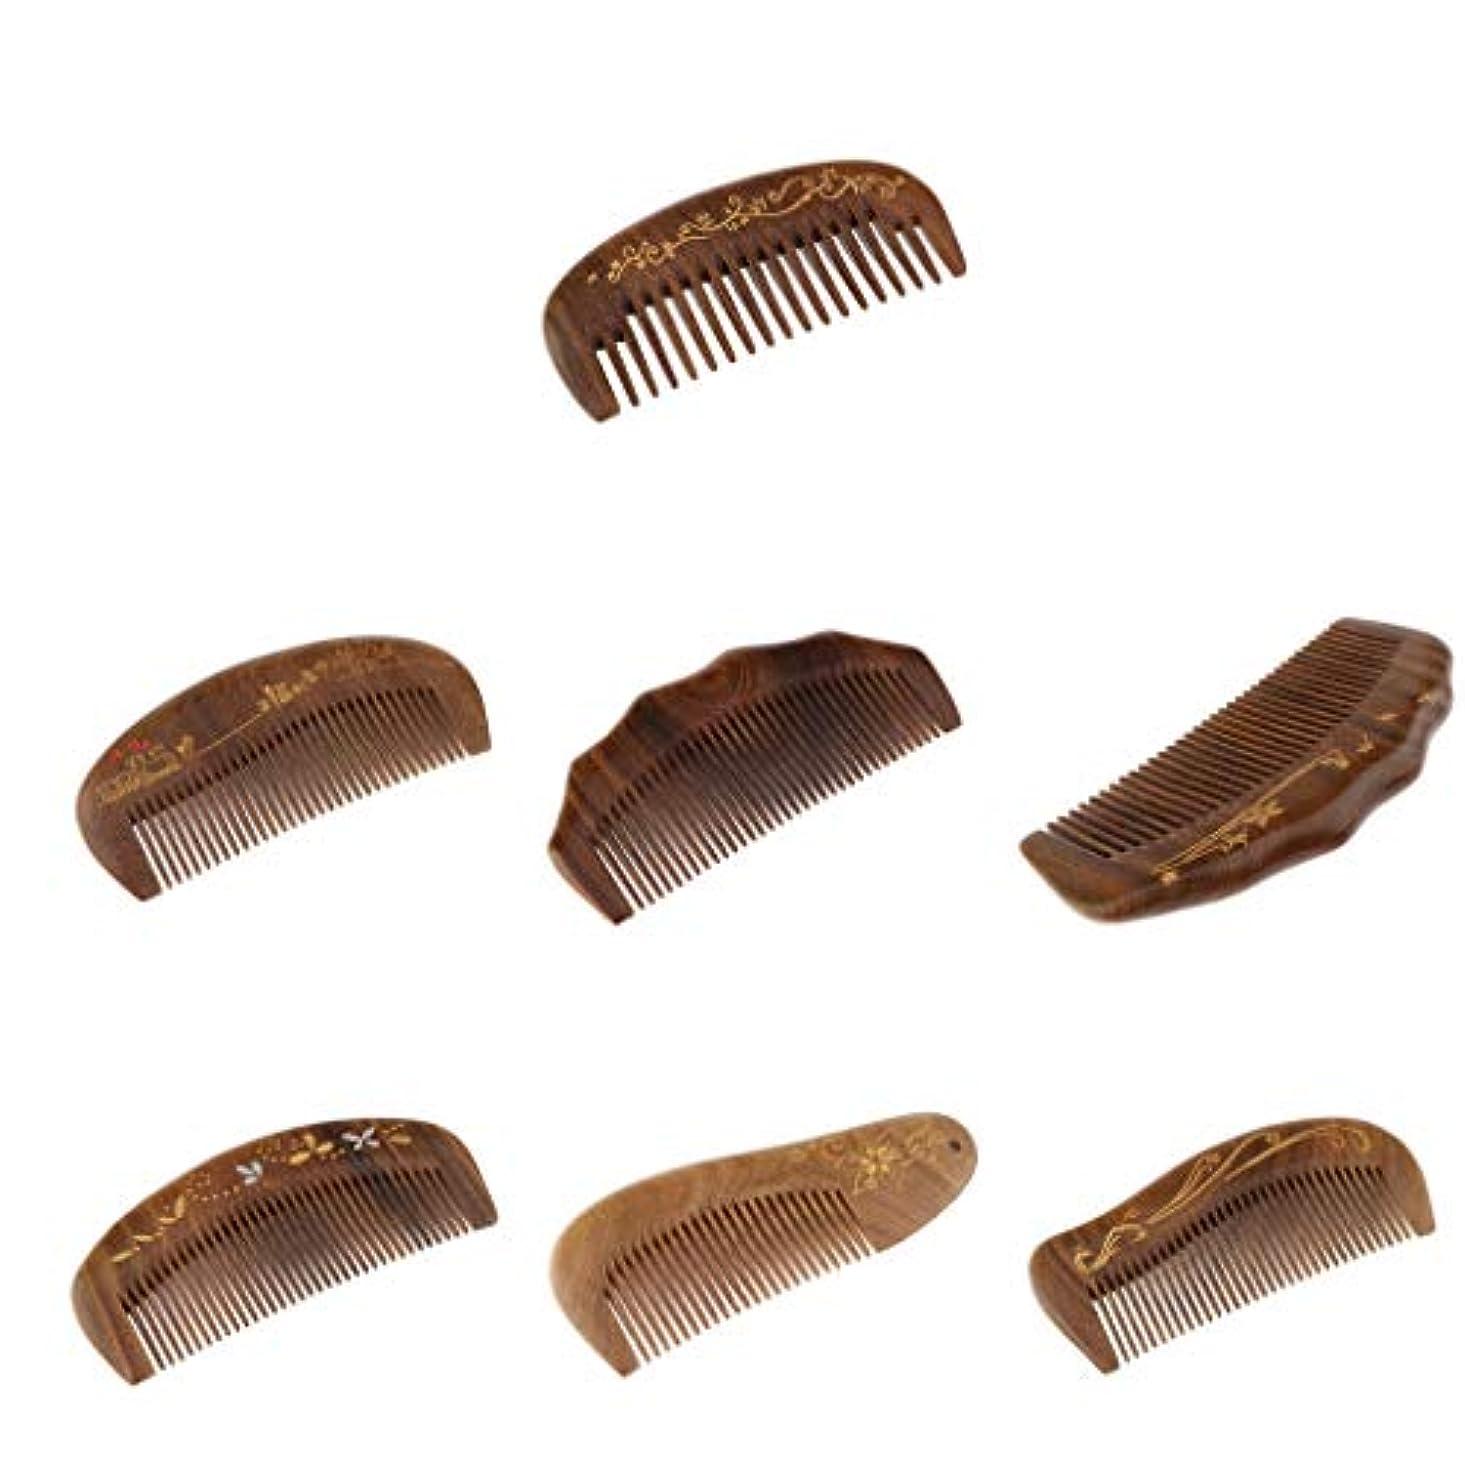 F Fityle 木製 コーム 細かい歯 ヘアブラシ ヘアコーム 全7個